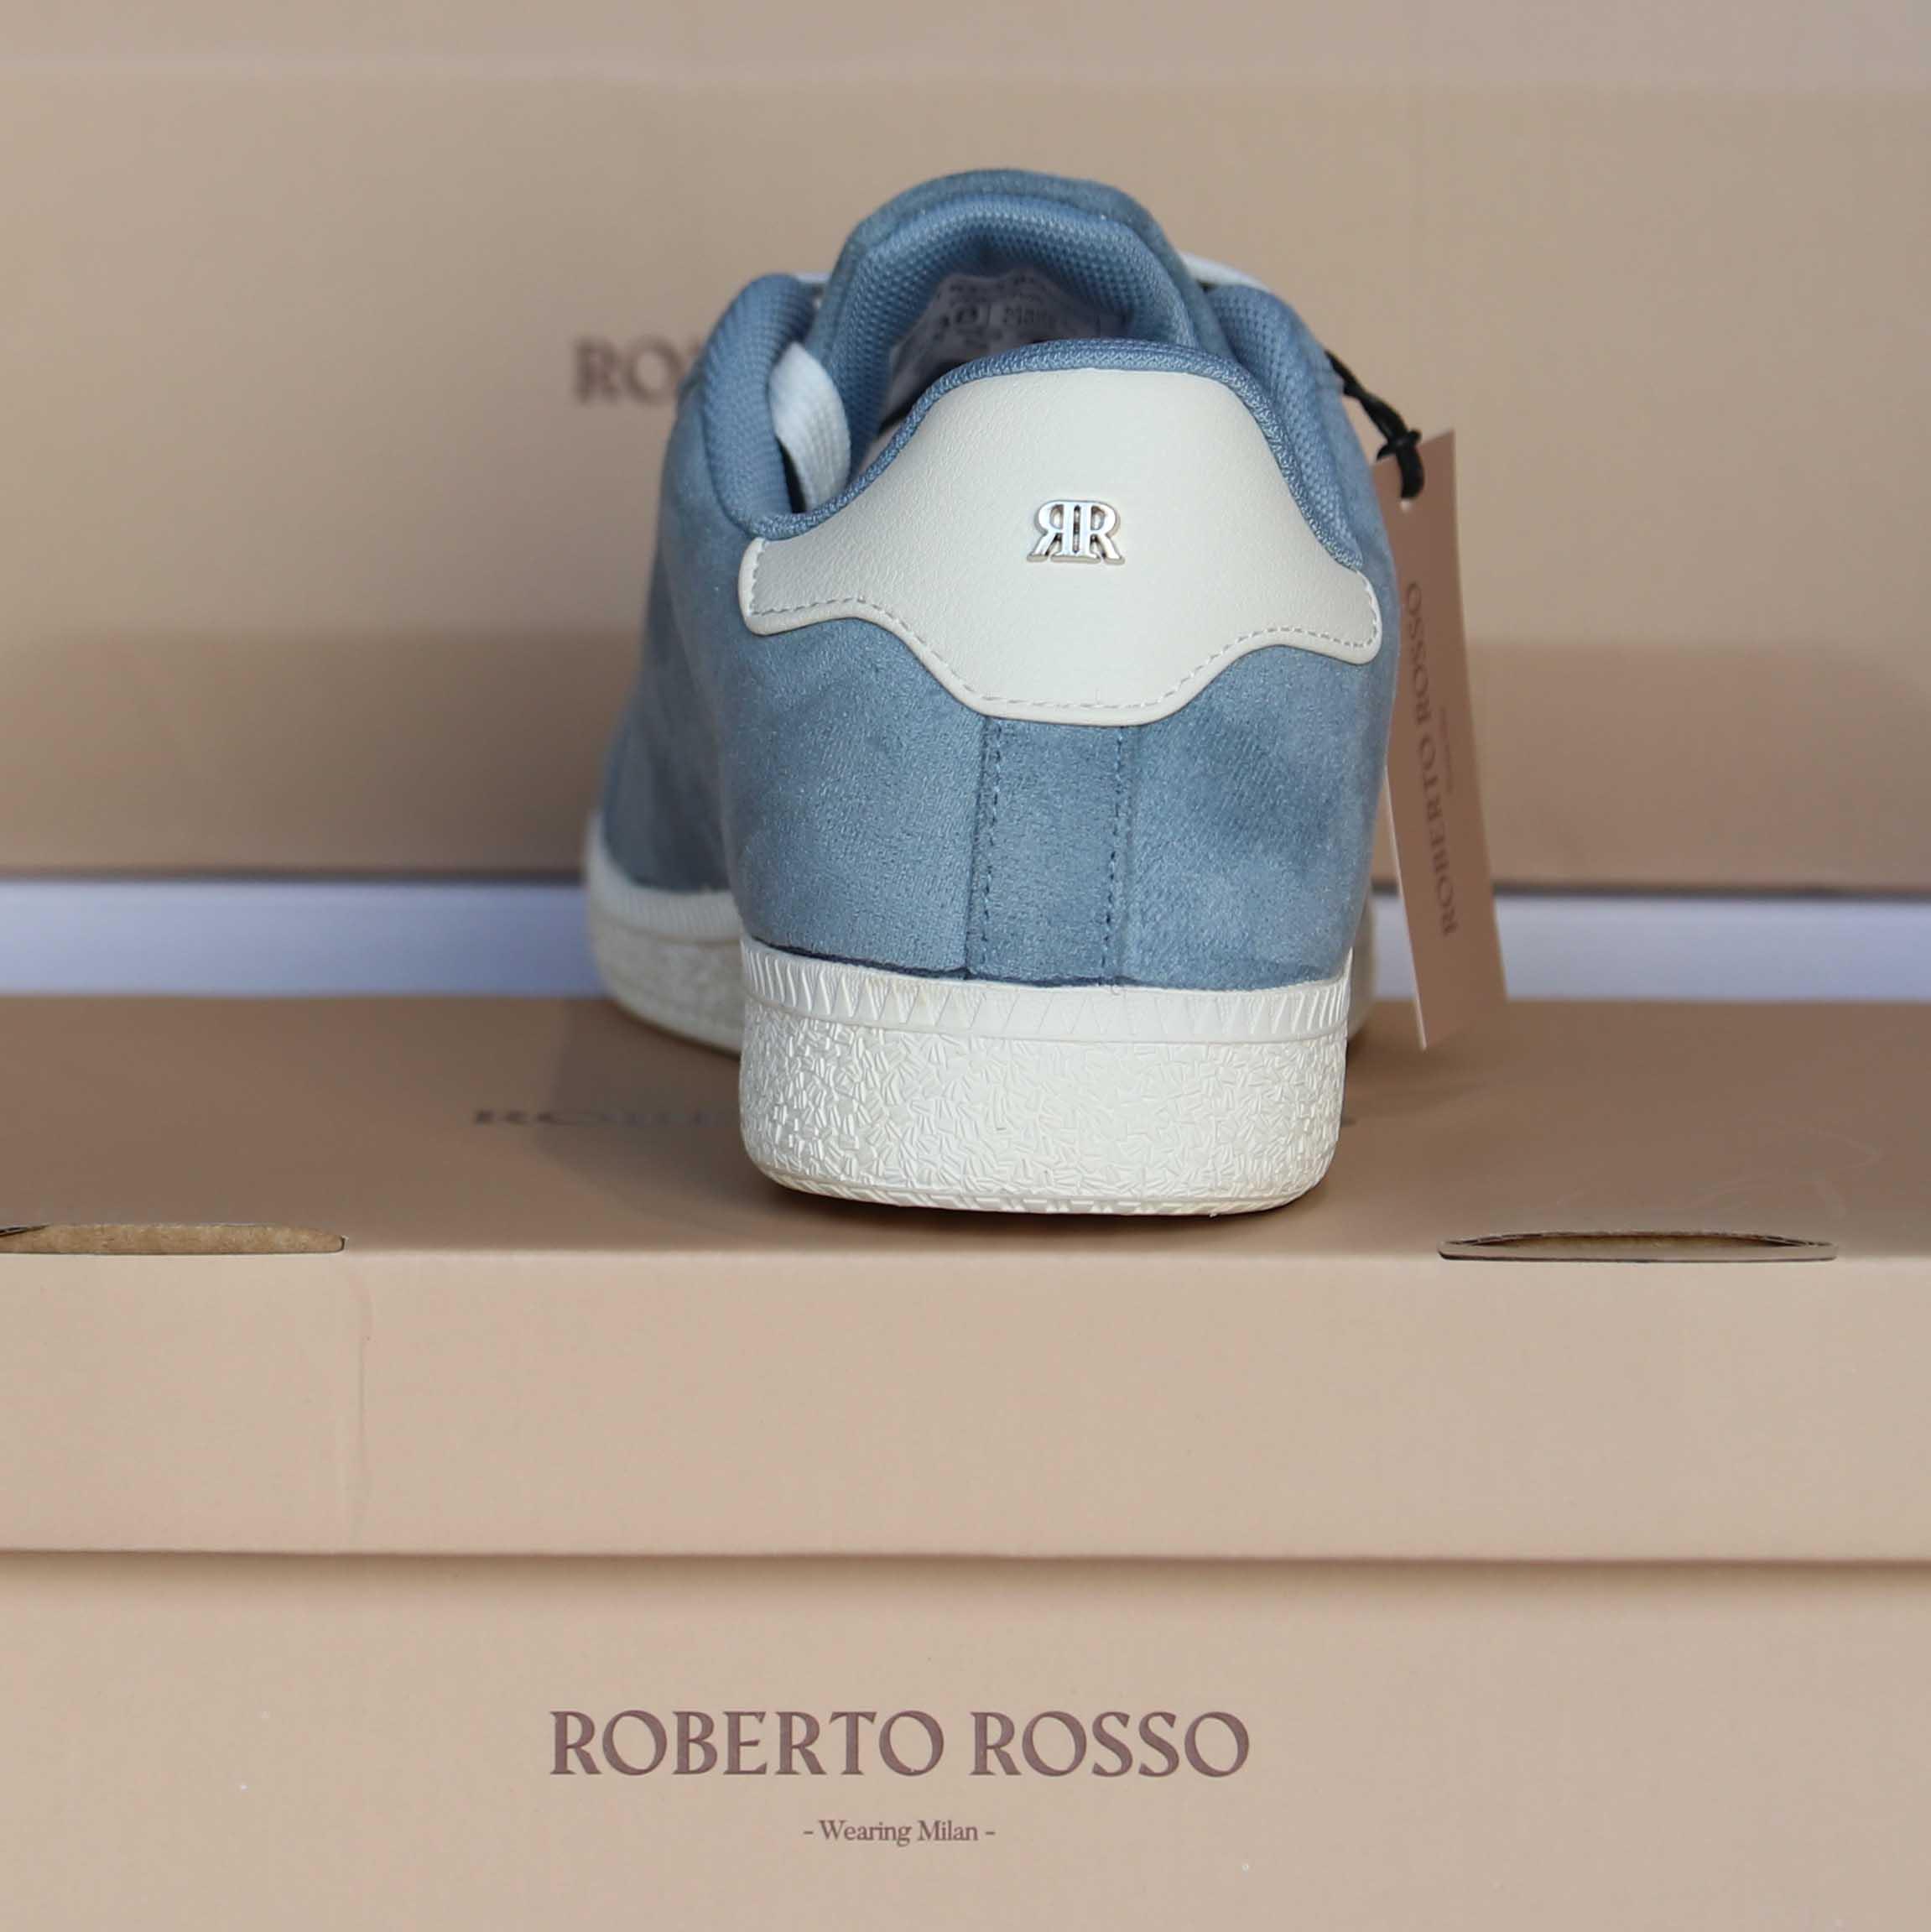 roberto rosso portiva blue sko sommer 2